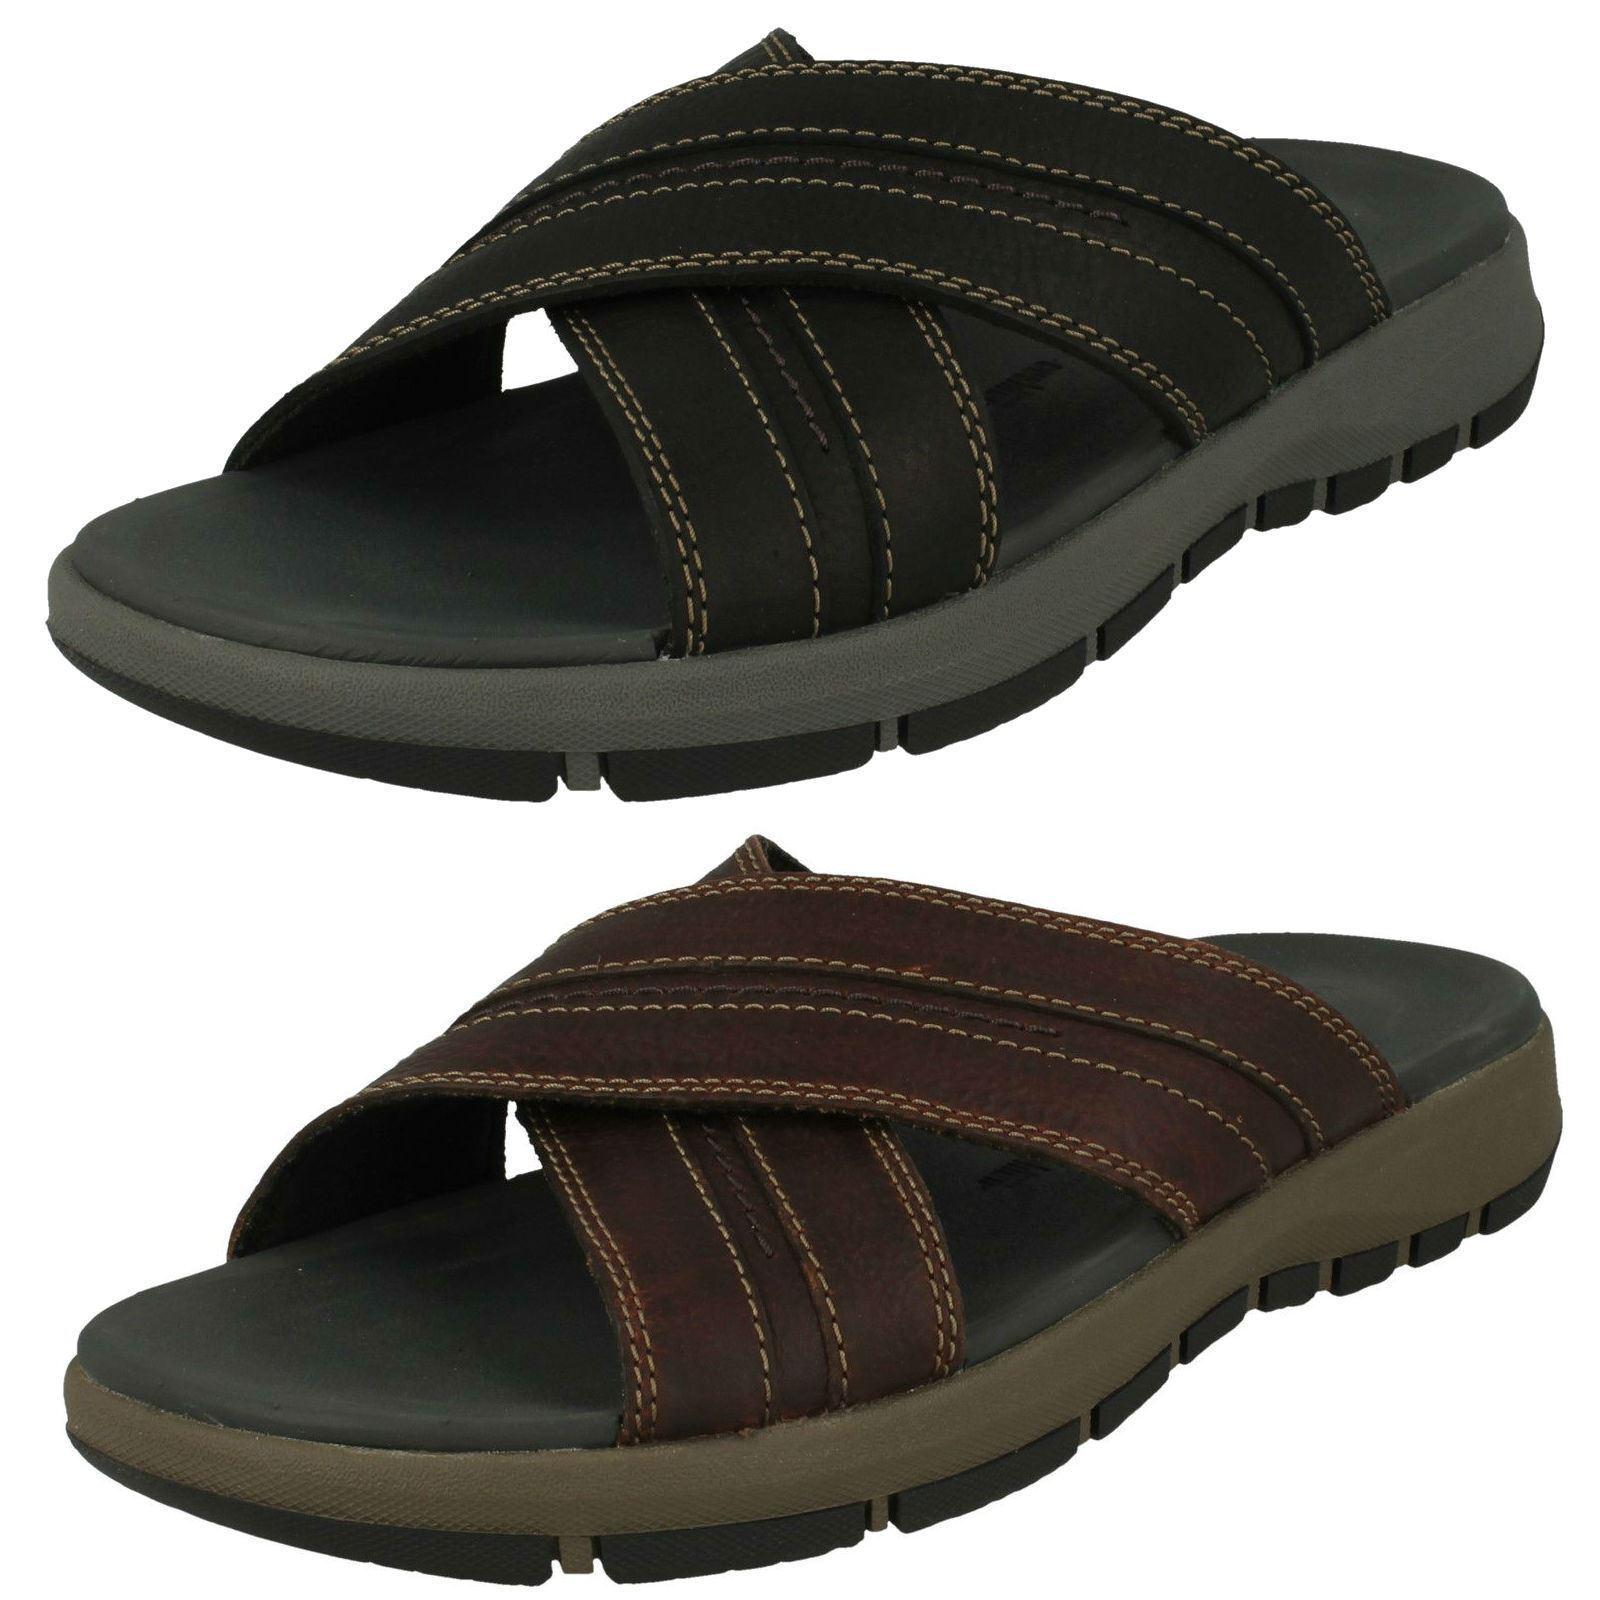 Mens Clarks Slip On Sandals - Brixby Cross